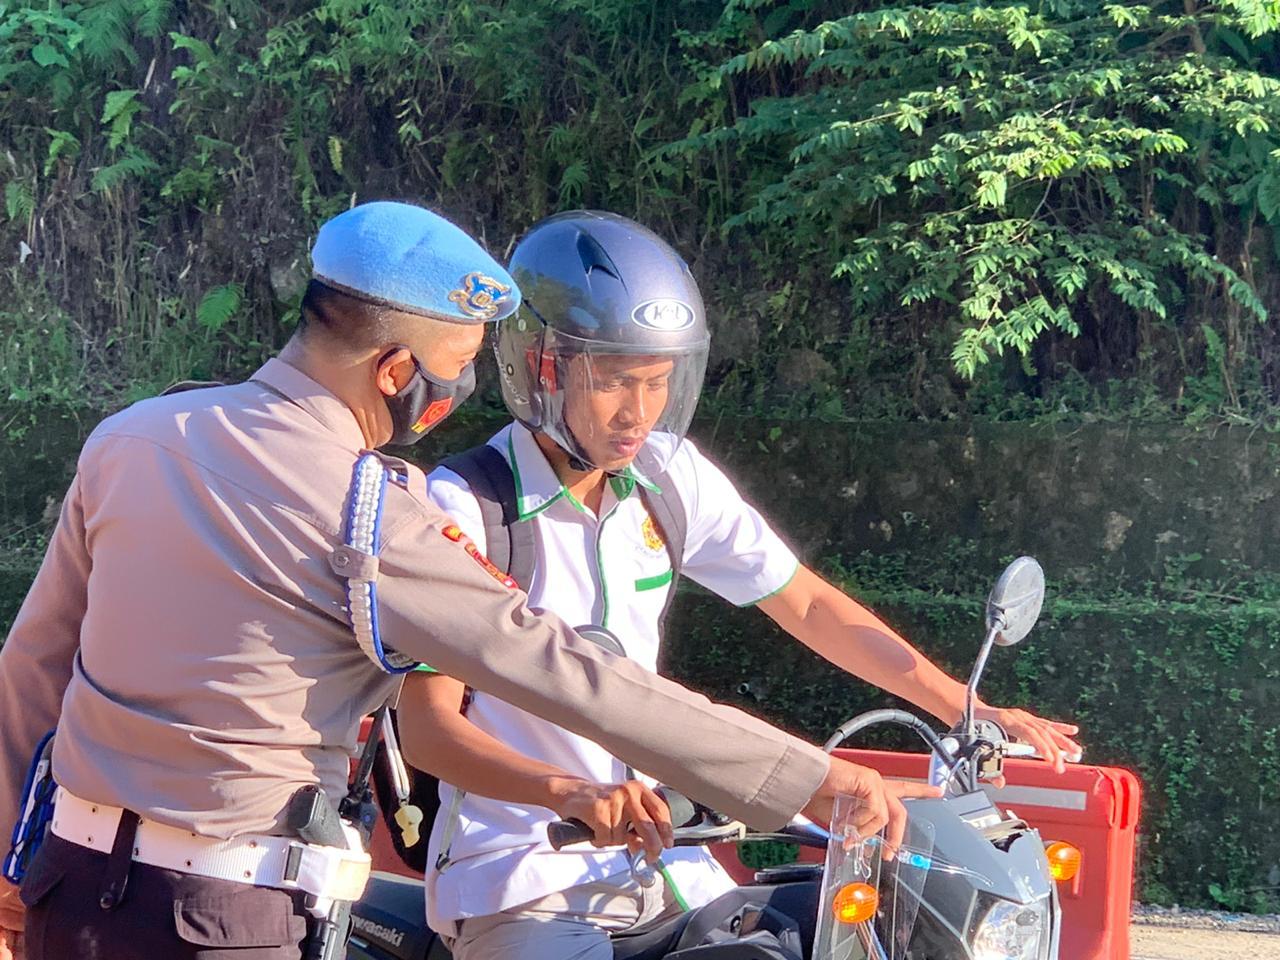 Propam Polda Sulbar Operasi Yustisia Terhadap Personil Polda Sulbar